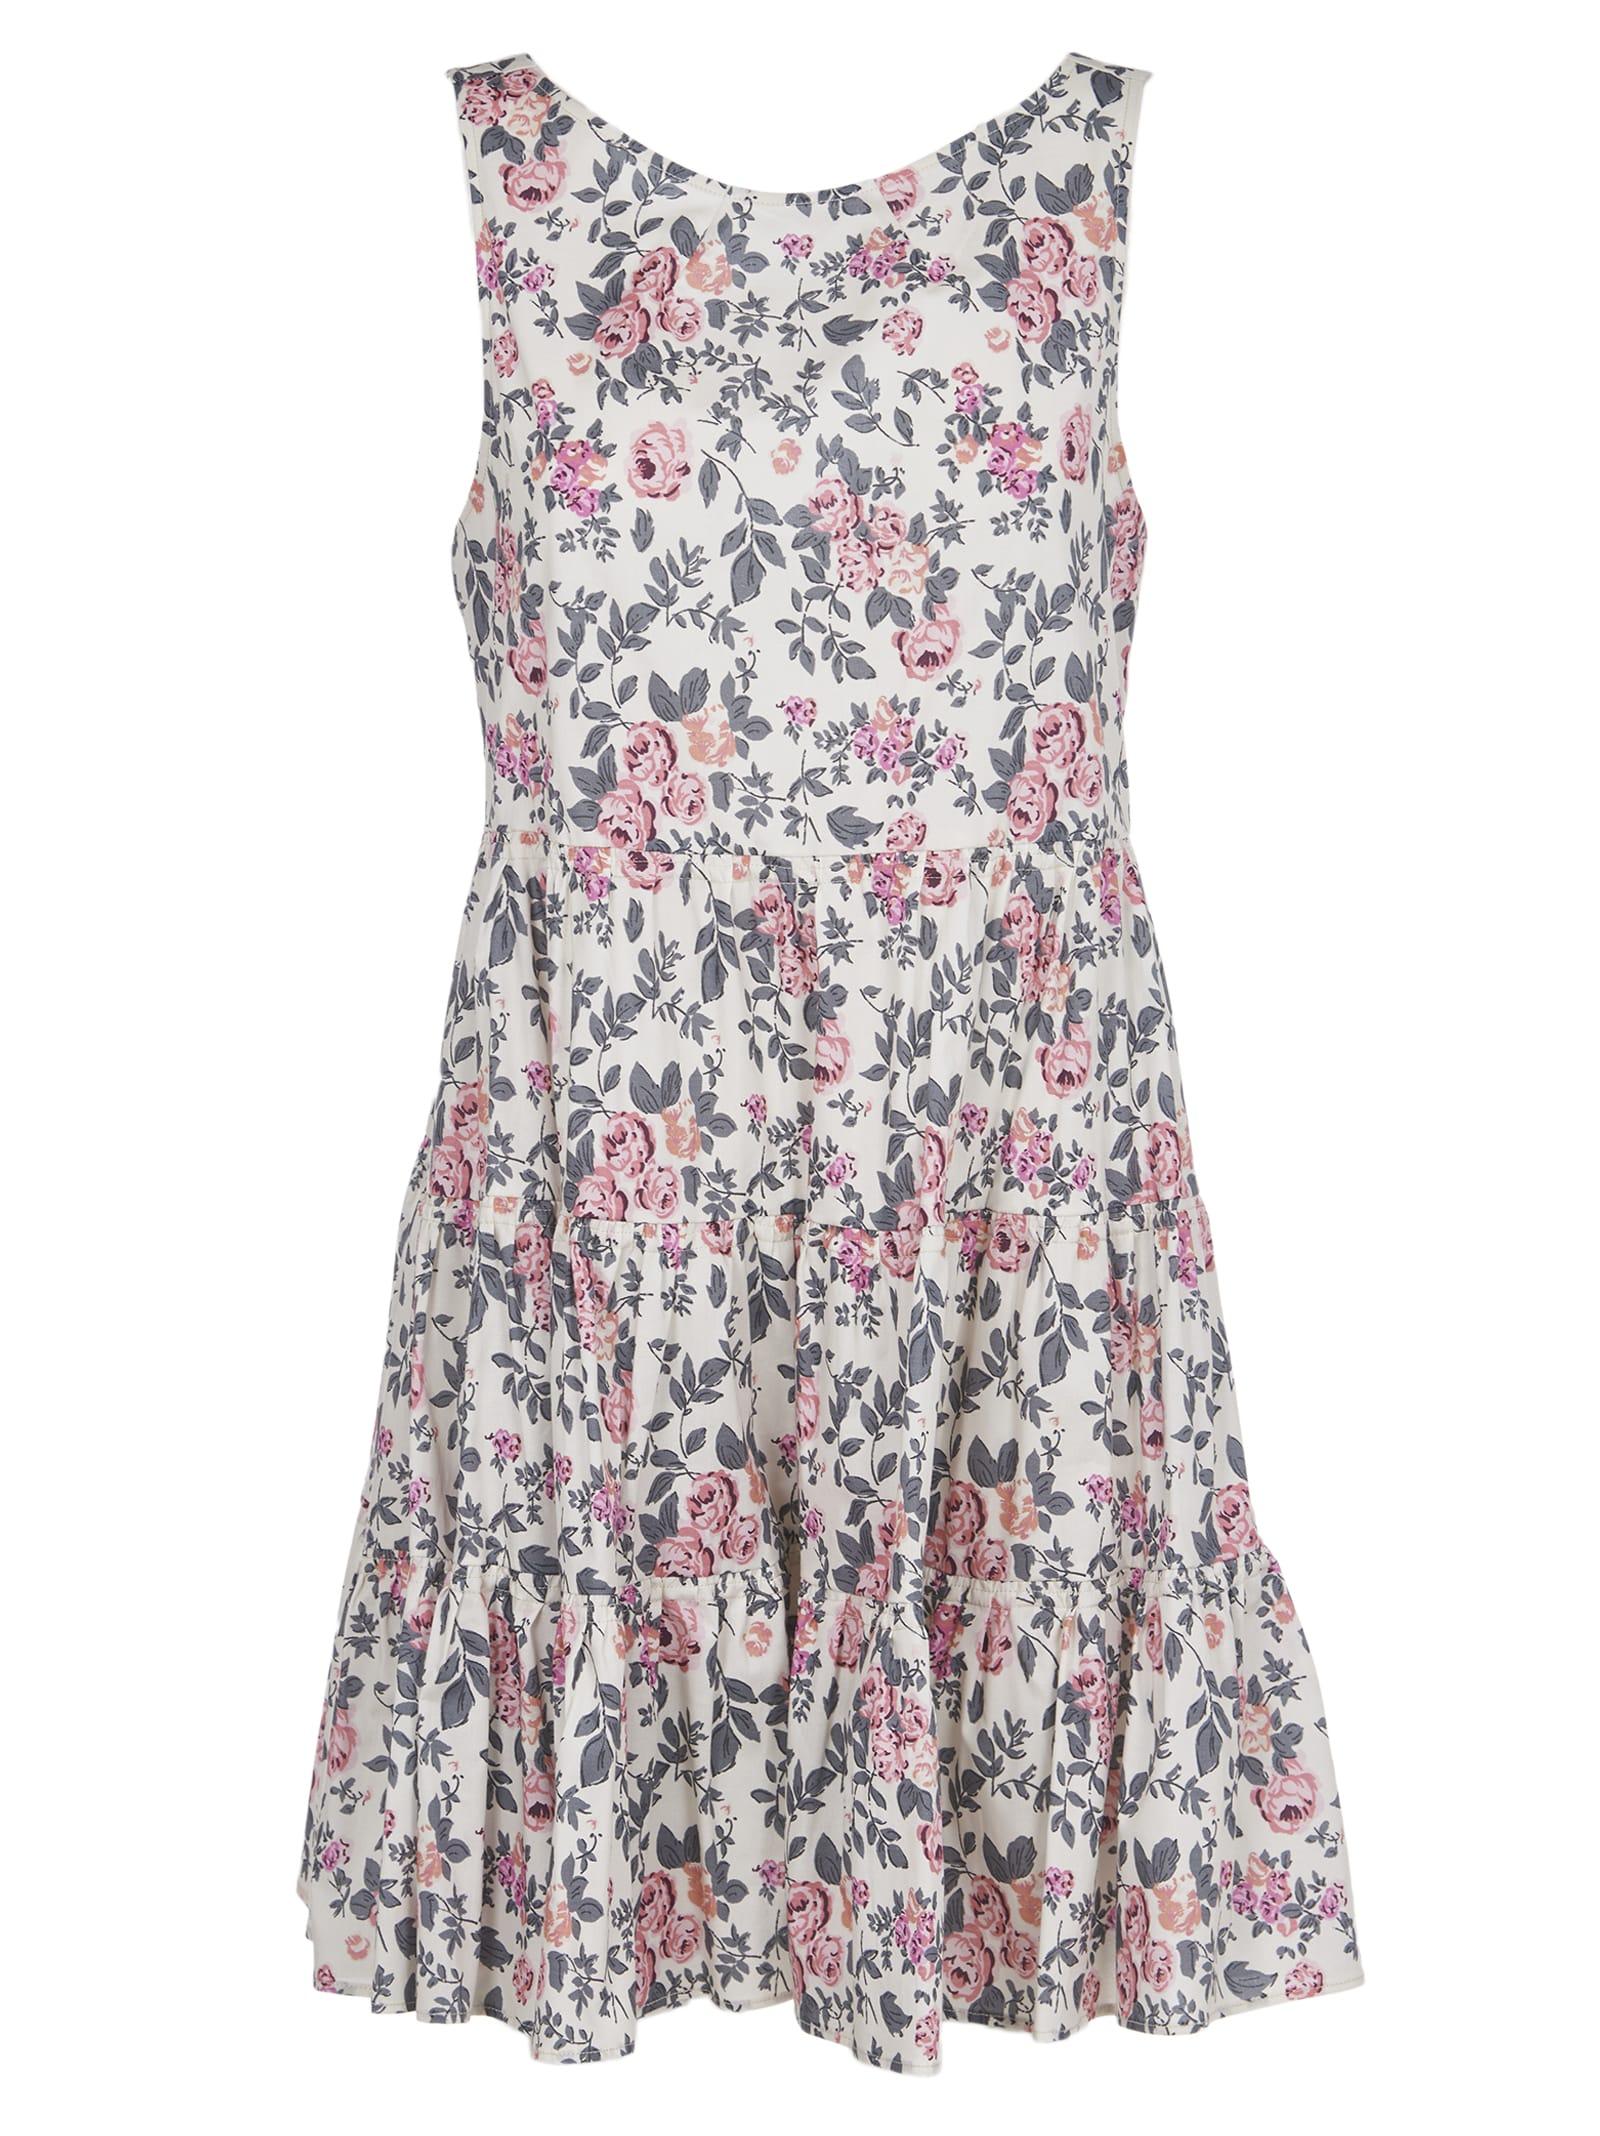 Semicouture Dresses FLORAL MINI DRESS